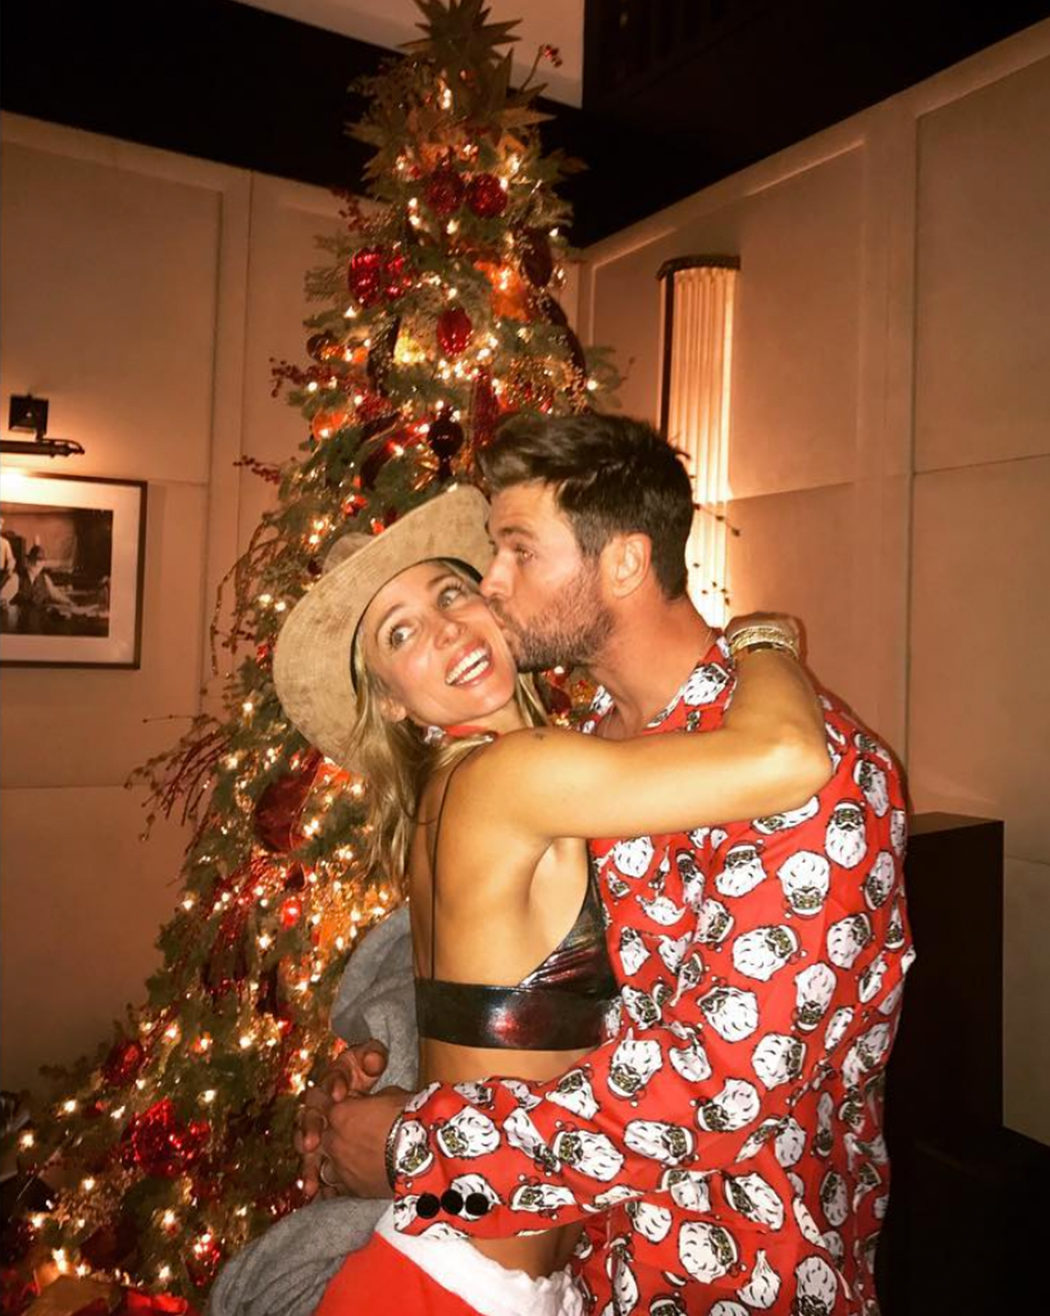 Elsa Pataky de fiesta con Chris Hemsworth